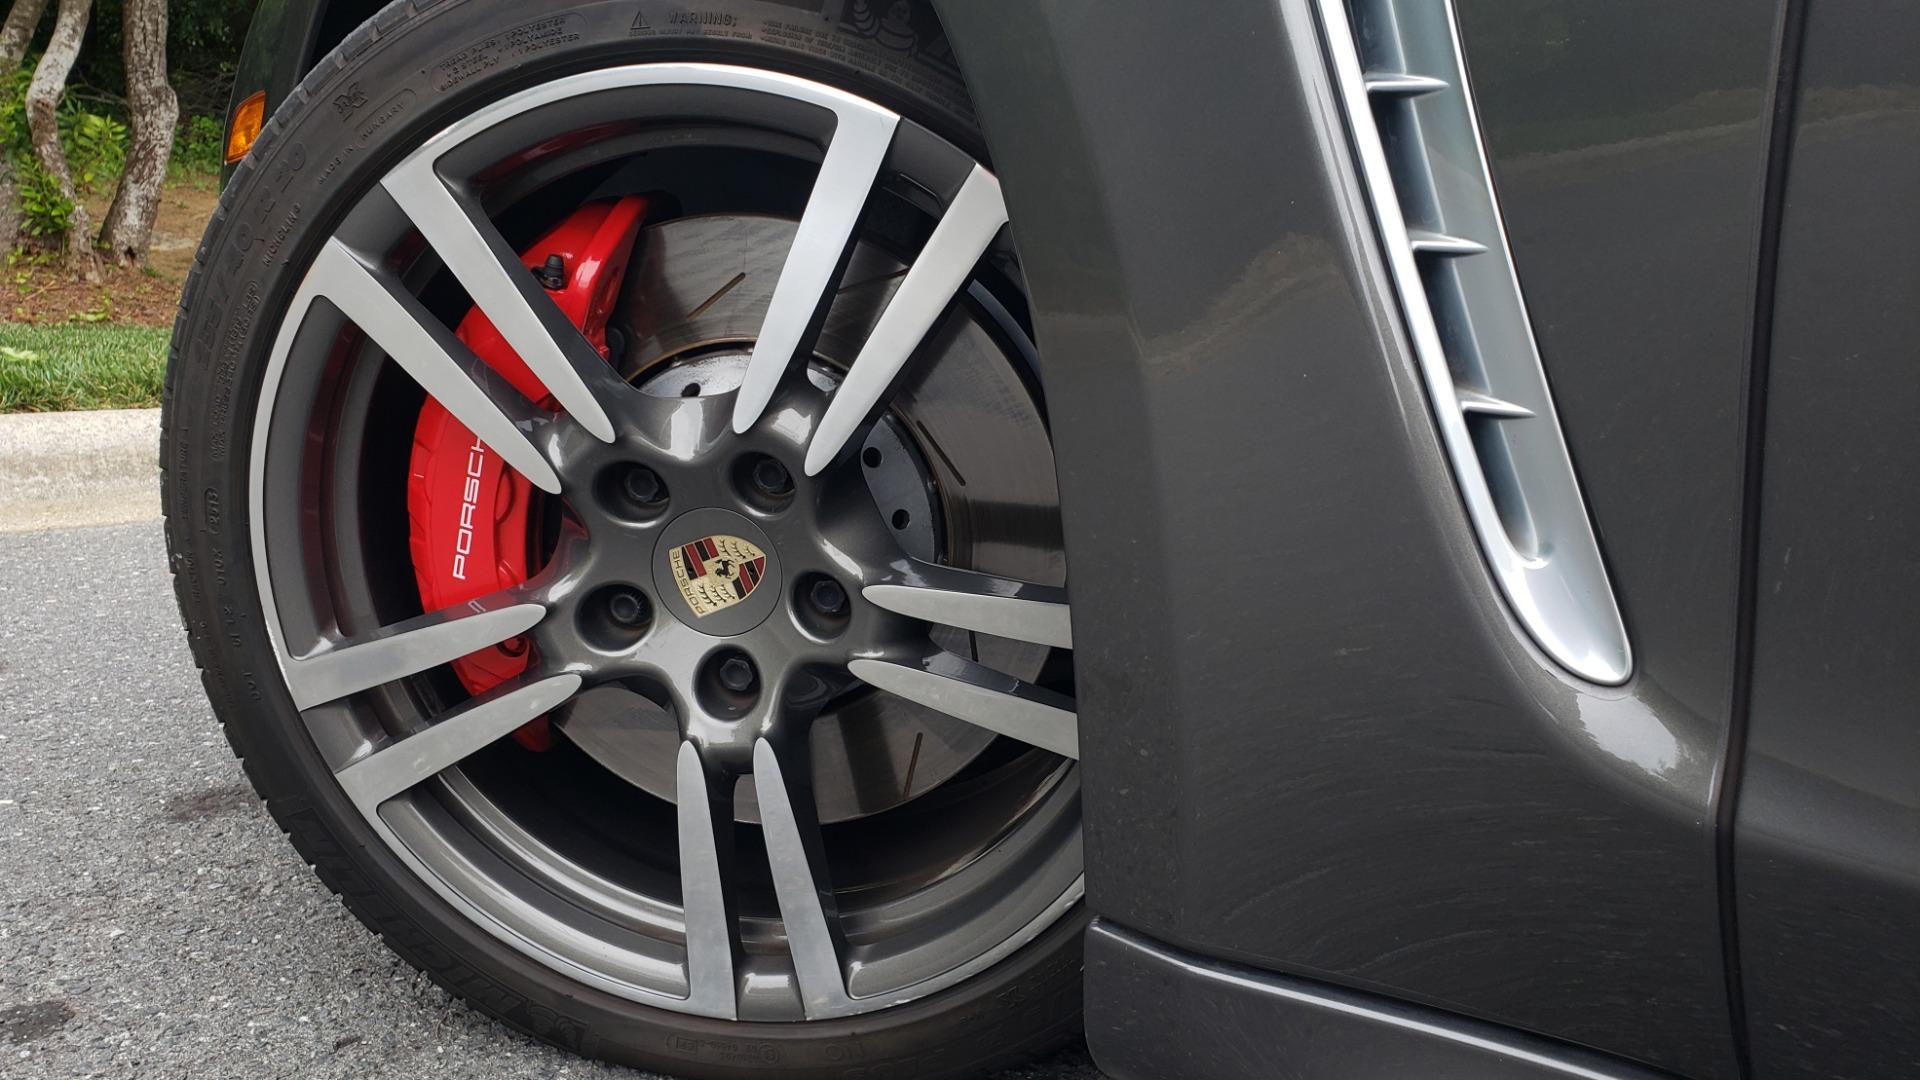 Used 2013 Porsche PANAMERA TURBO 4.8L V8 / AWD / NAV / SUNROOF / LCA / PARK ASST / BURMESTER for sale $45,995 at Formula Imports in Charlotte NC 28227 96